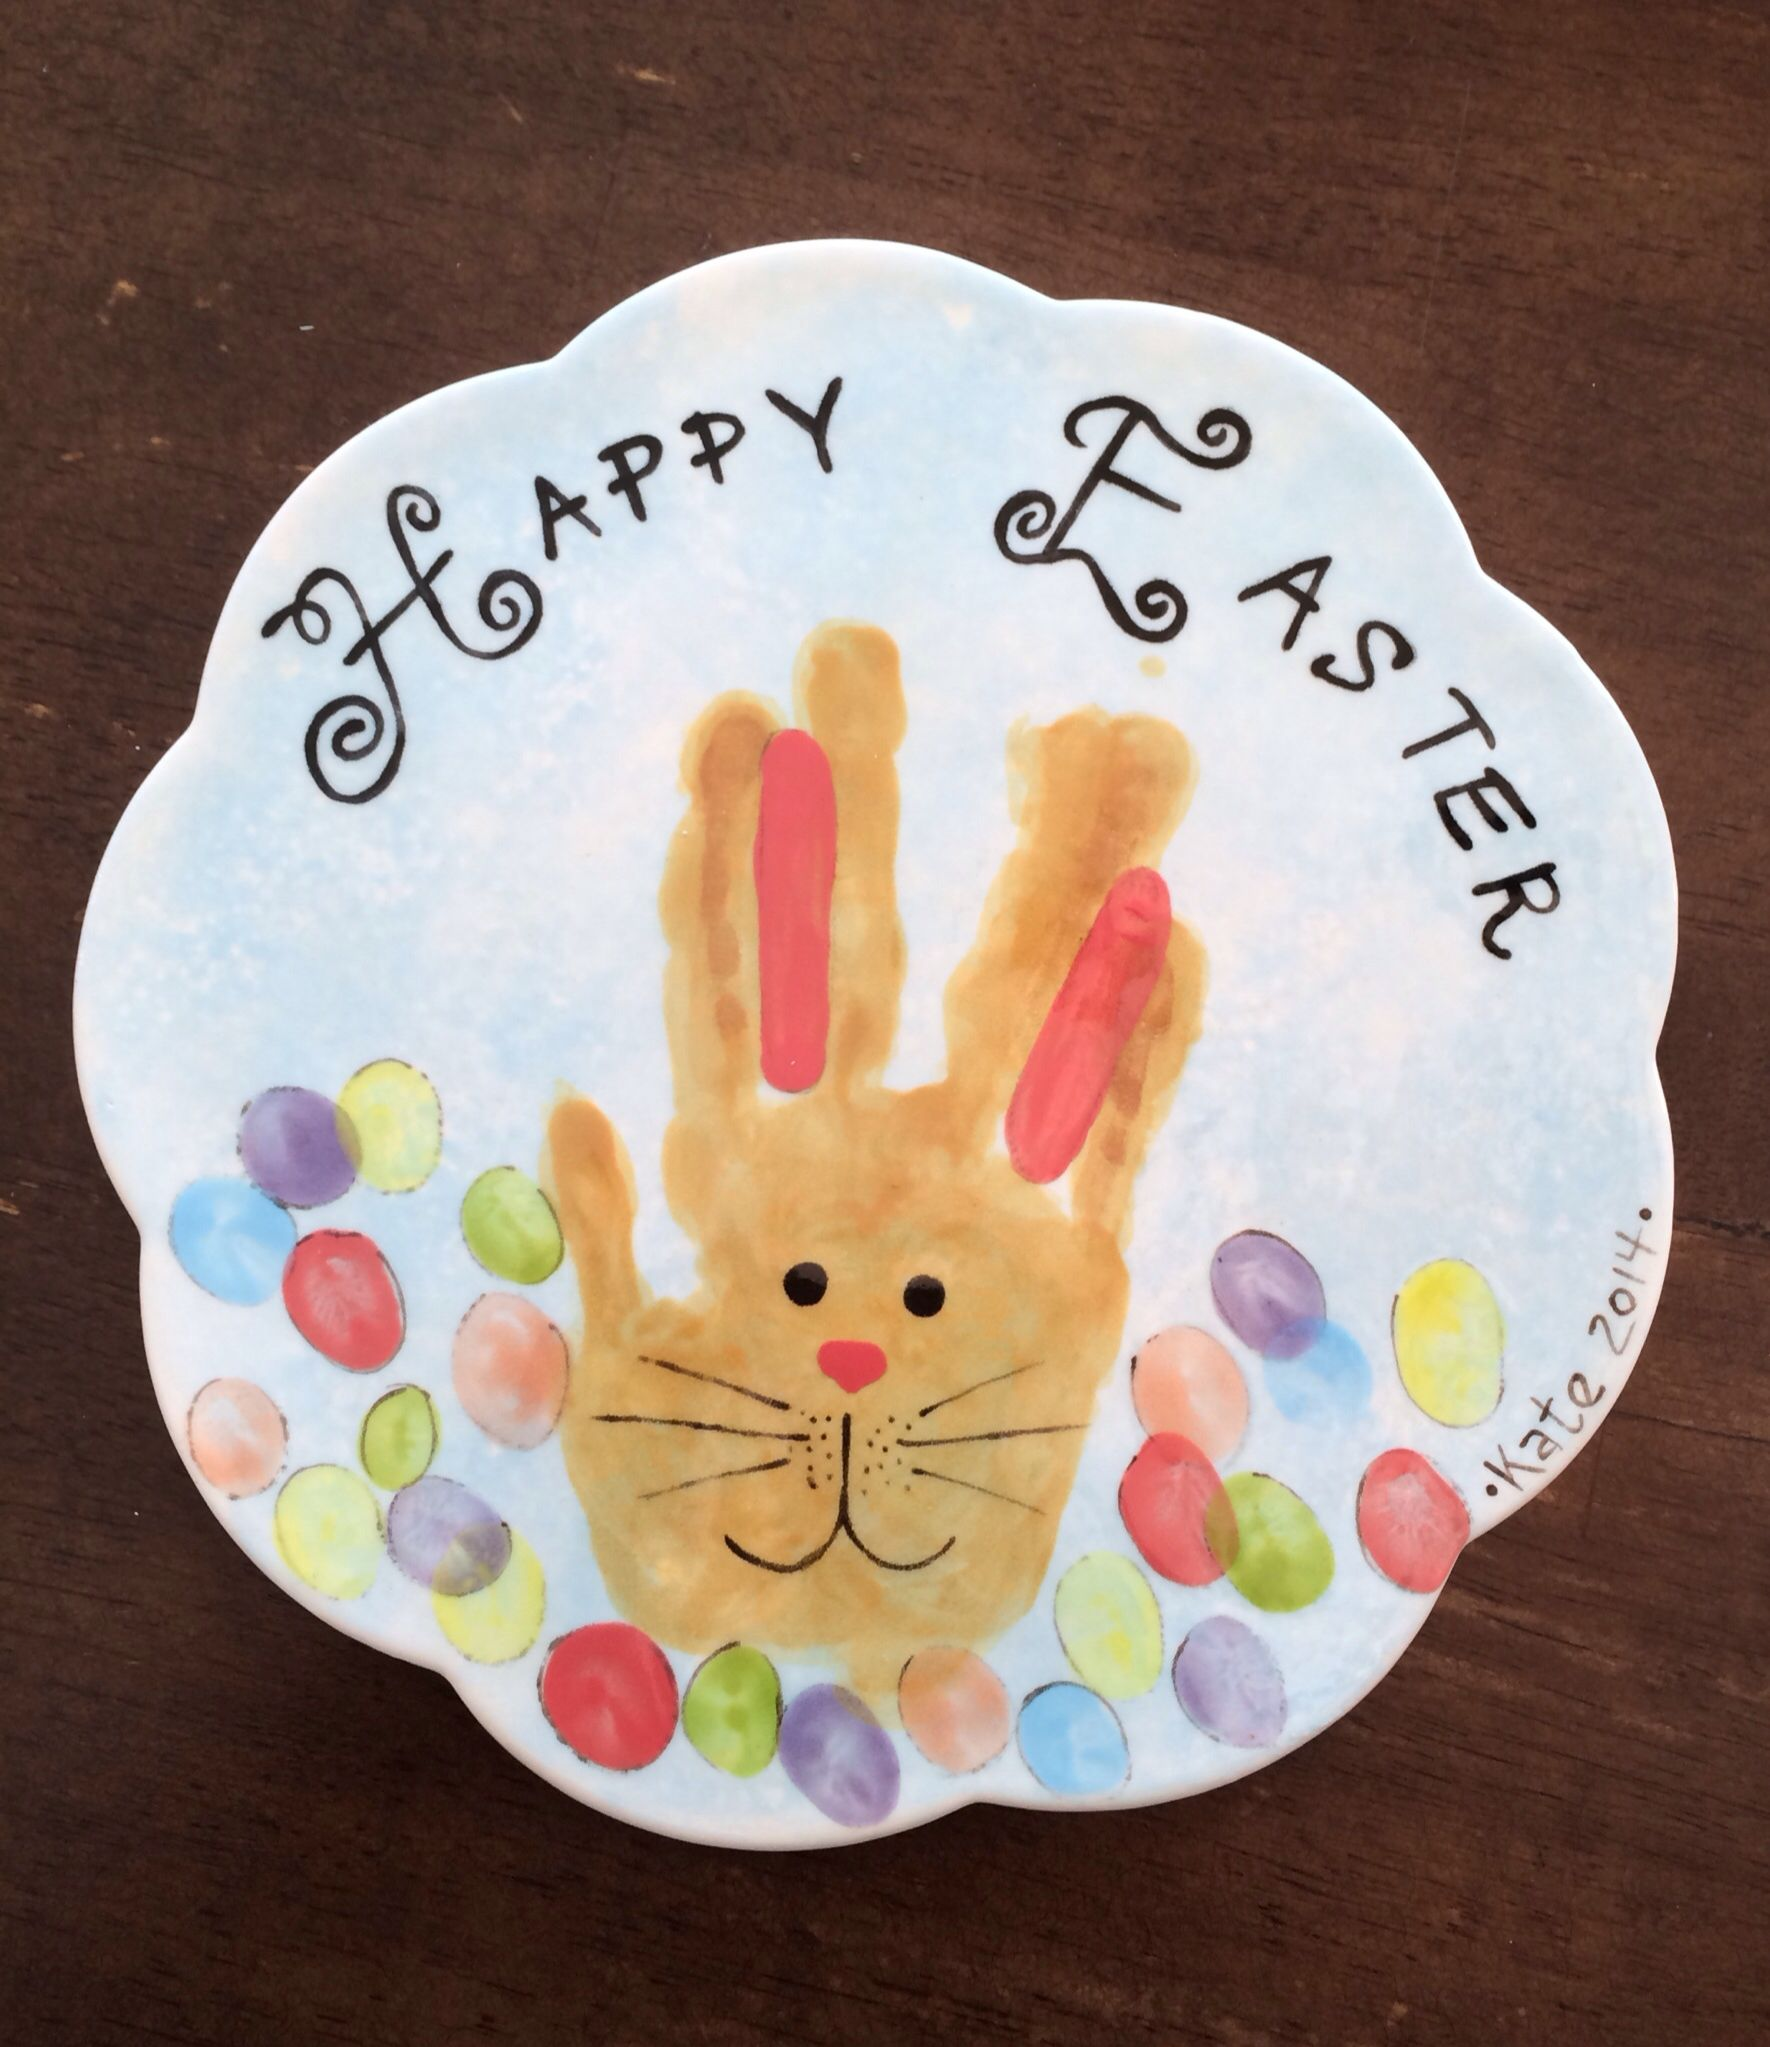 Easter bunny handprint ceramic tile trivet crafts for Handprint ceramic plate ideas